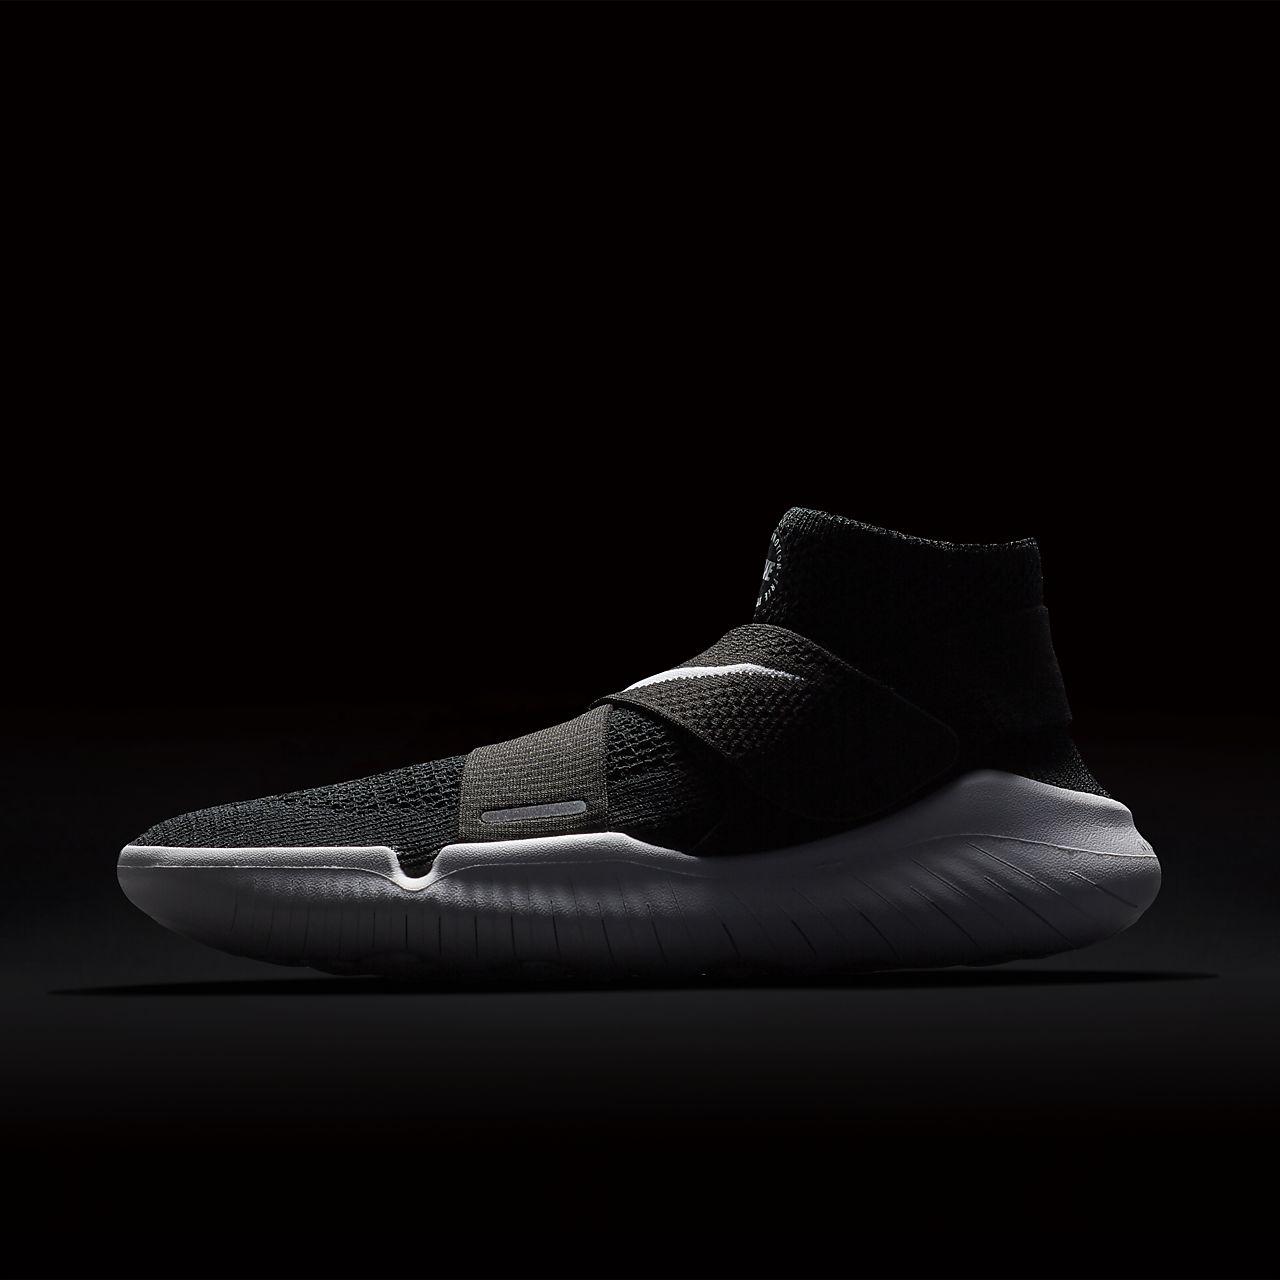 e65766c5ed6 Nike Free RN Motion Flyknit 2018 Men s Running Shoe. Nike.com ID